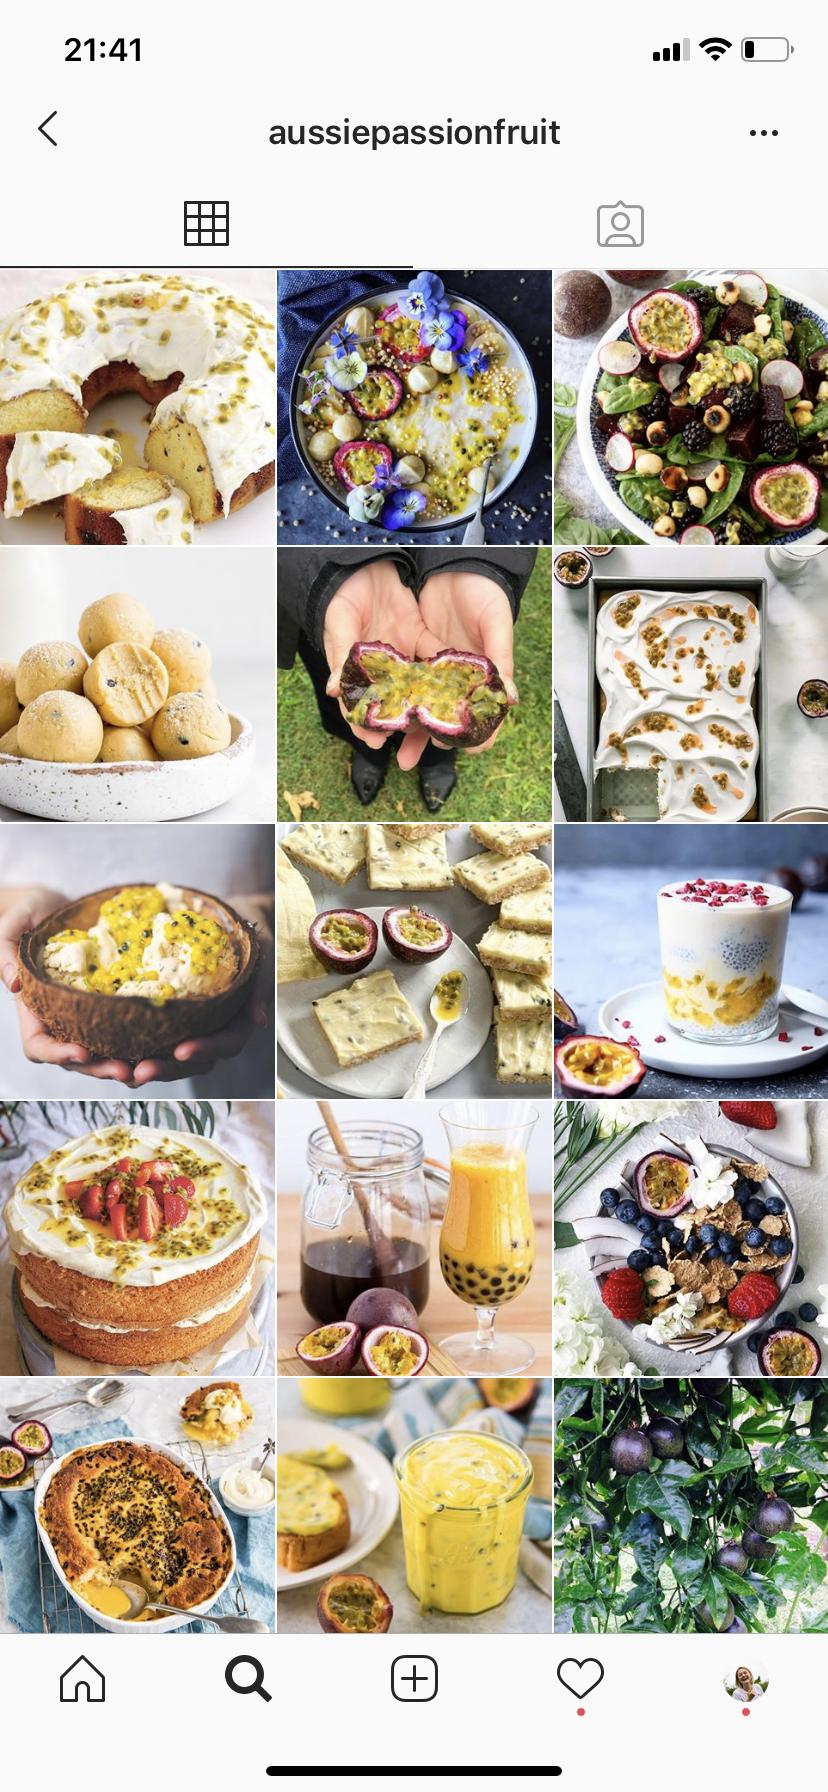 Quel layout choisir pour son feed instagram ?